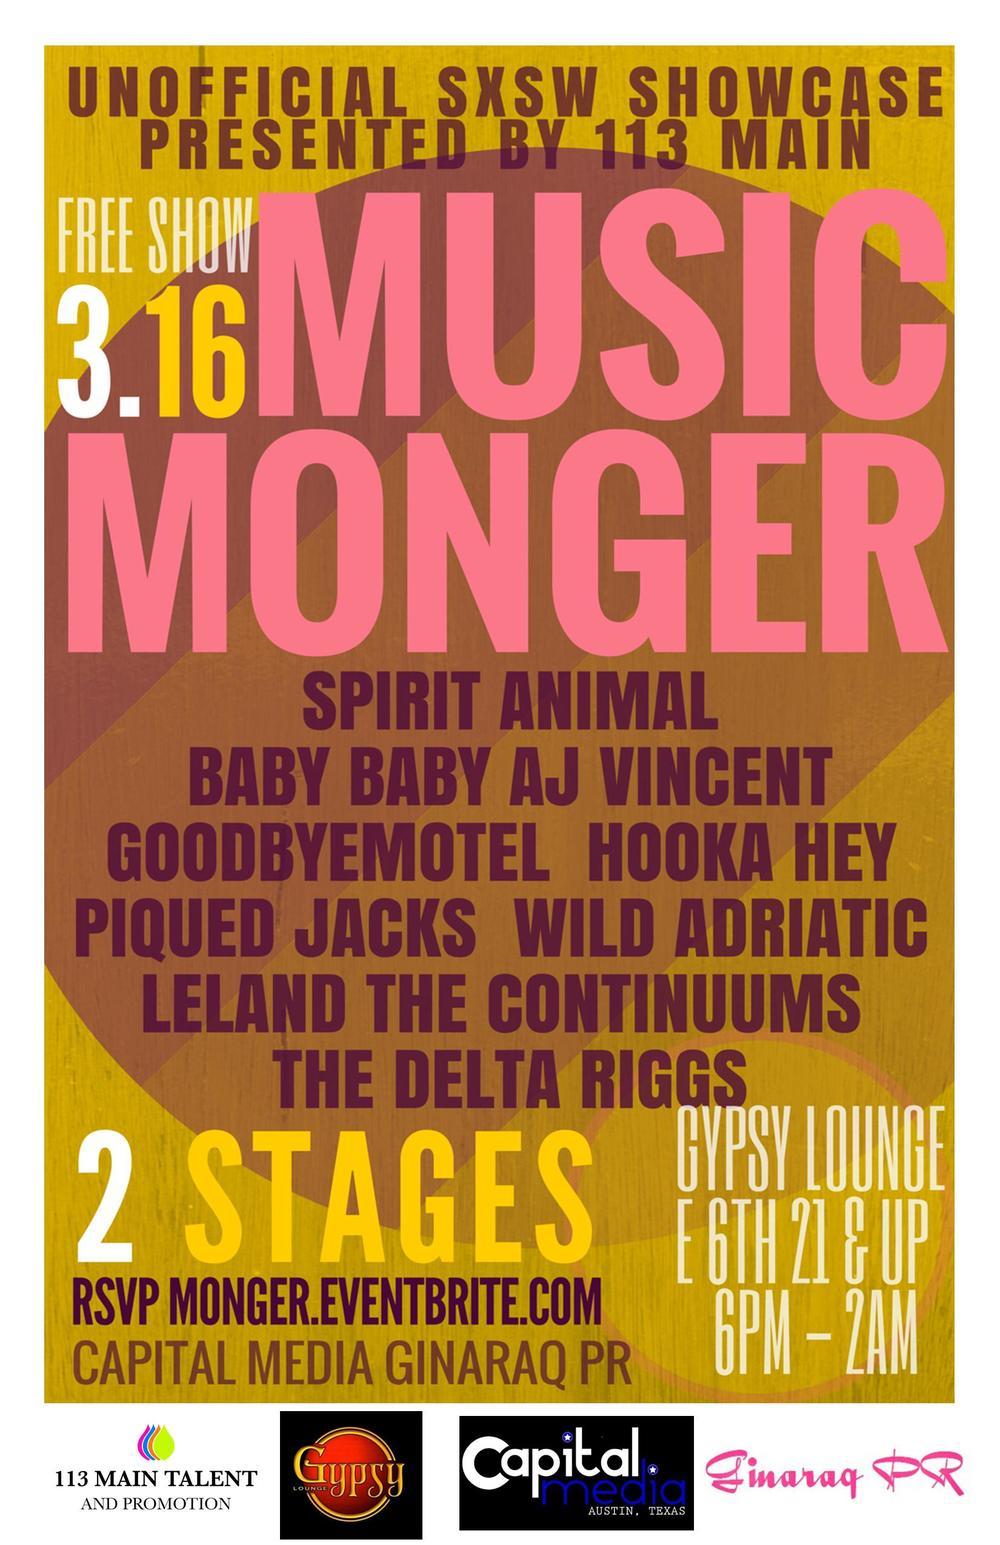 Musicmongermondaygoodbyemotelsxsw2015